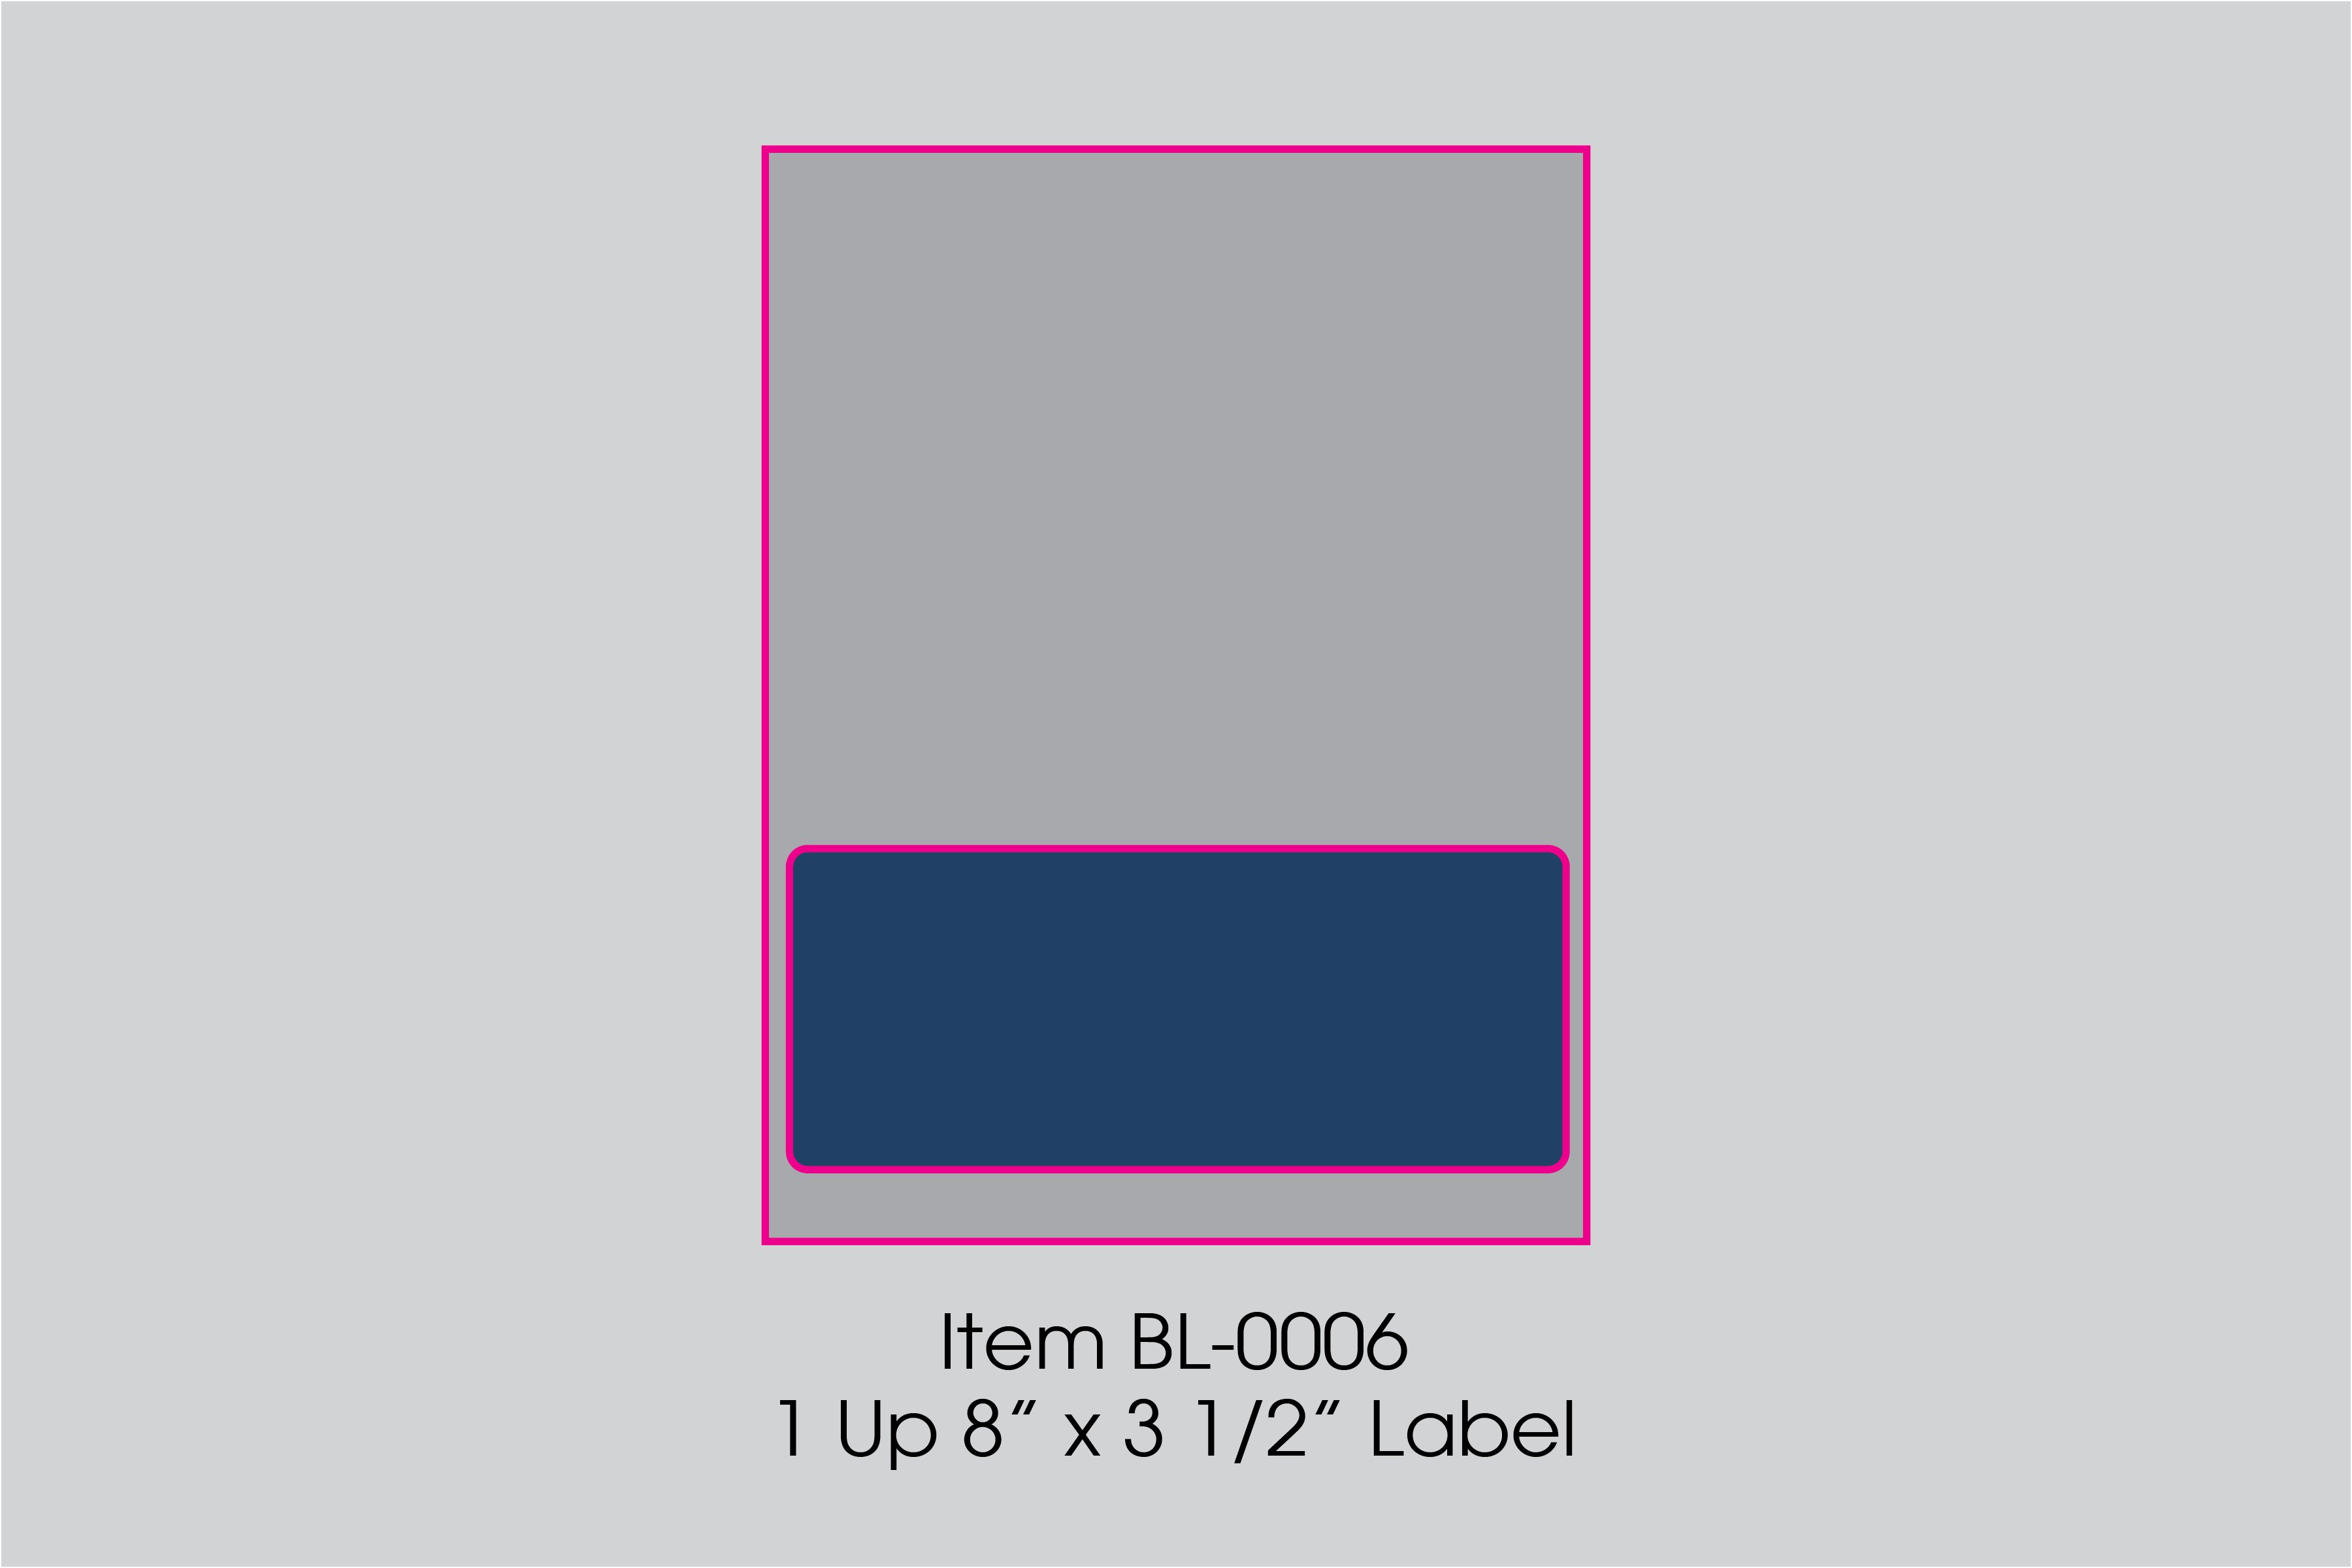 BL-0006